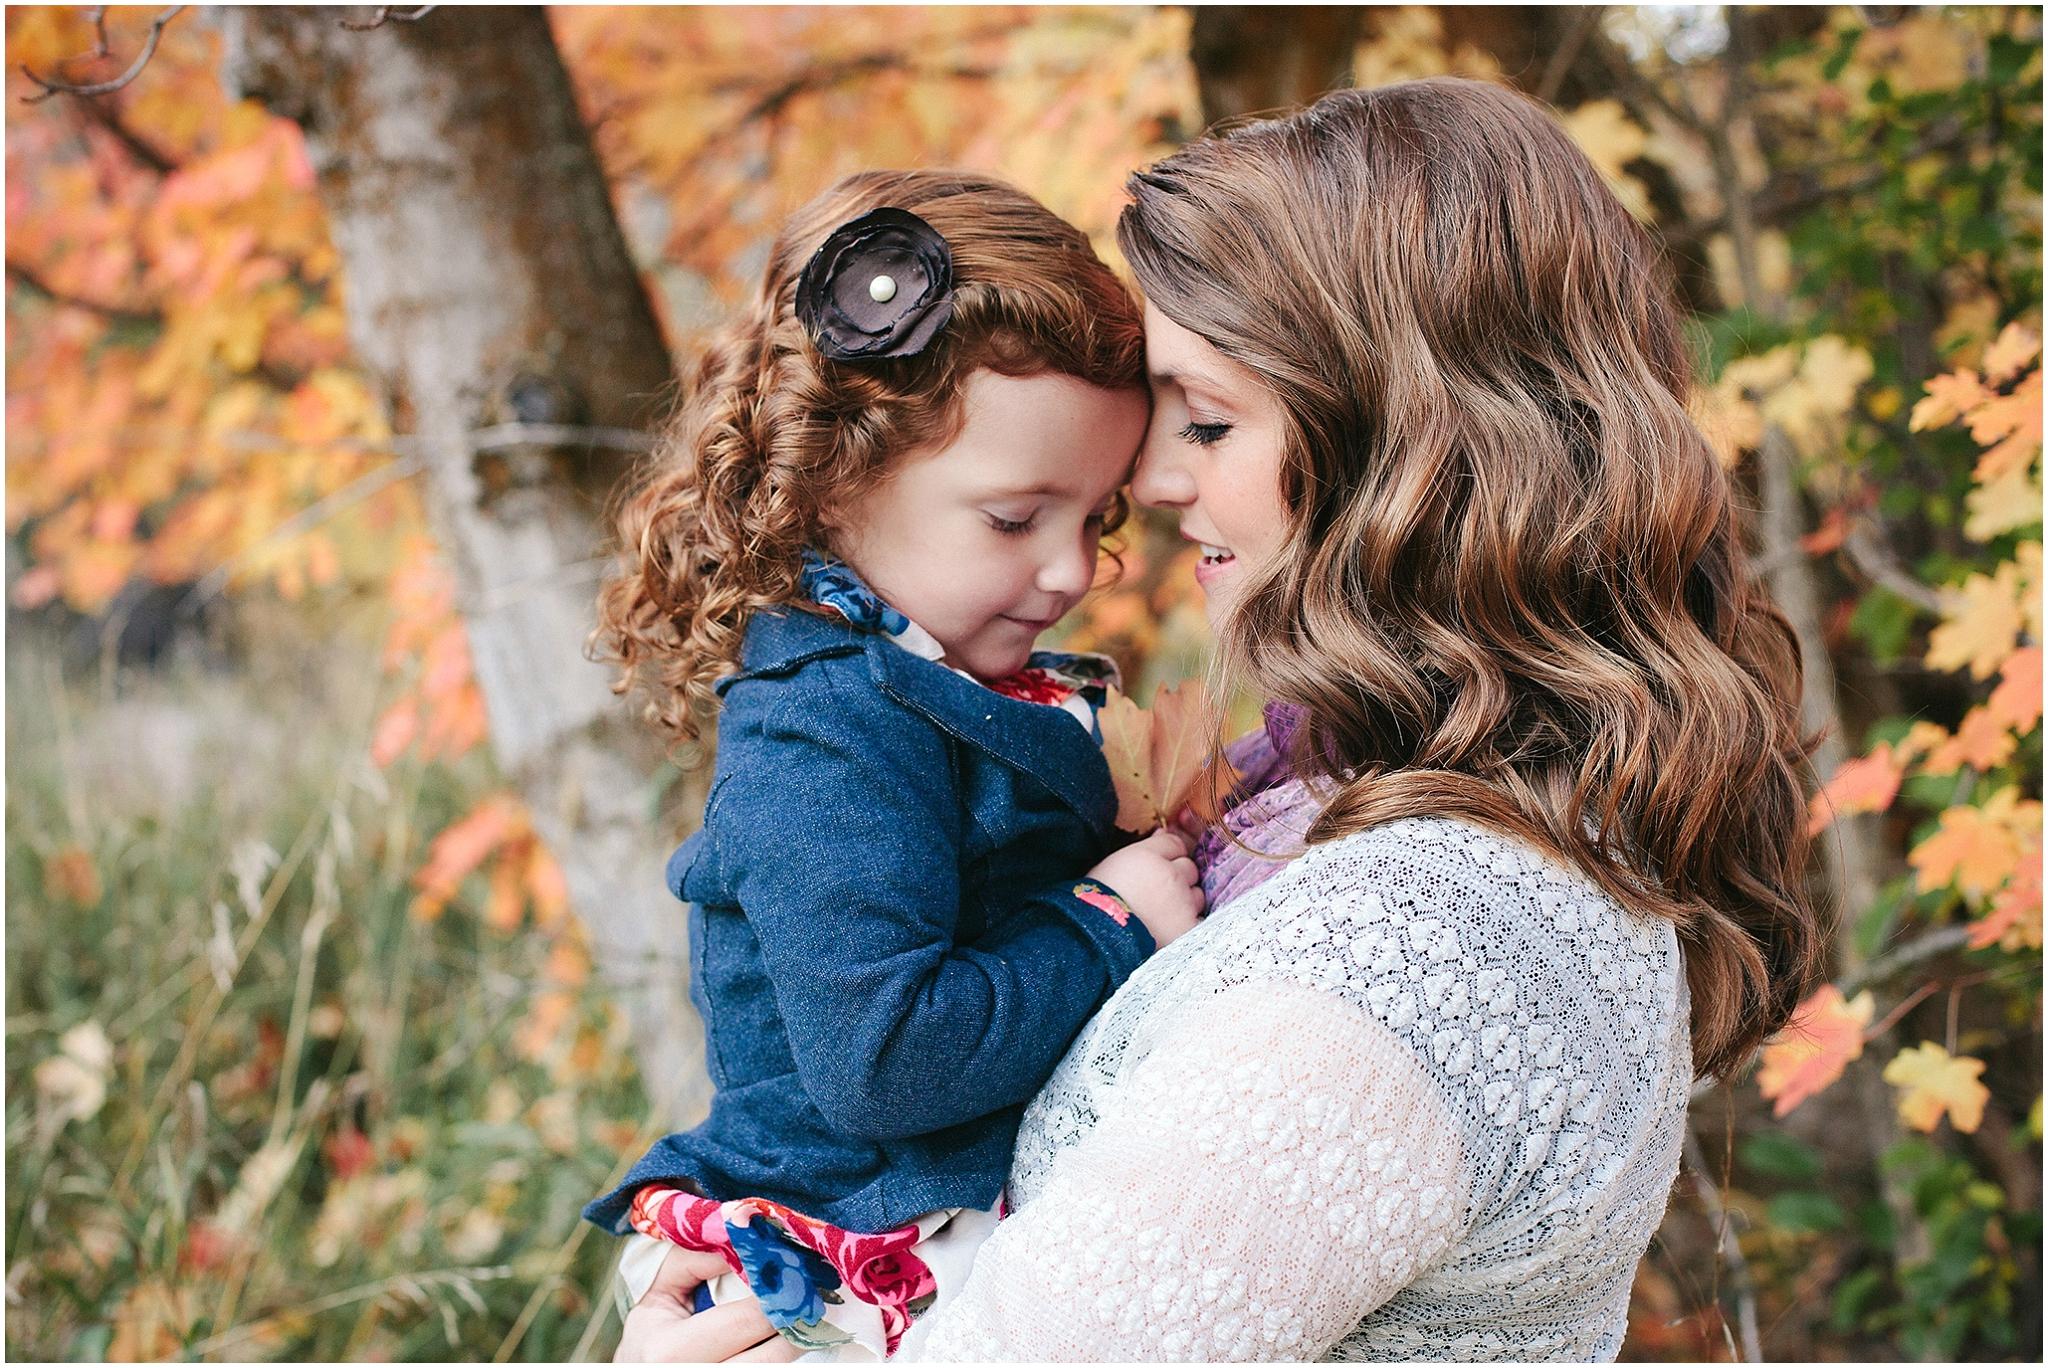 Barson-15-Edit-109_Lizzie-B-Imagery-Utah-Family-Photographer-Salt-Lake-City-Utah-County-Park-City.jpg